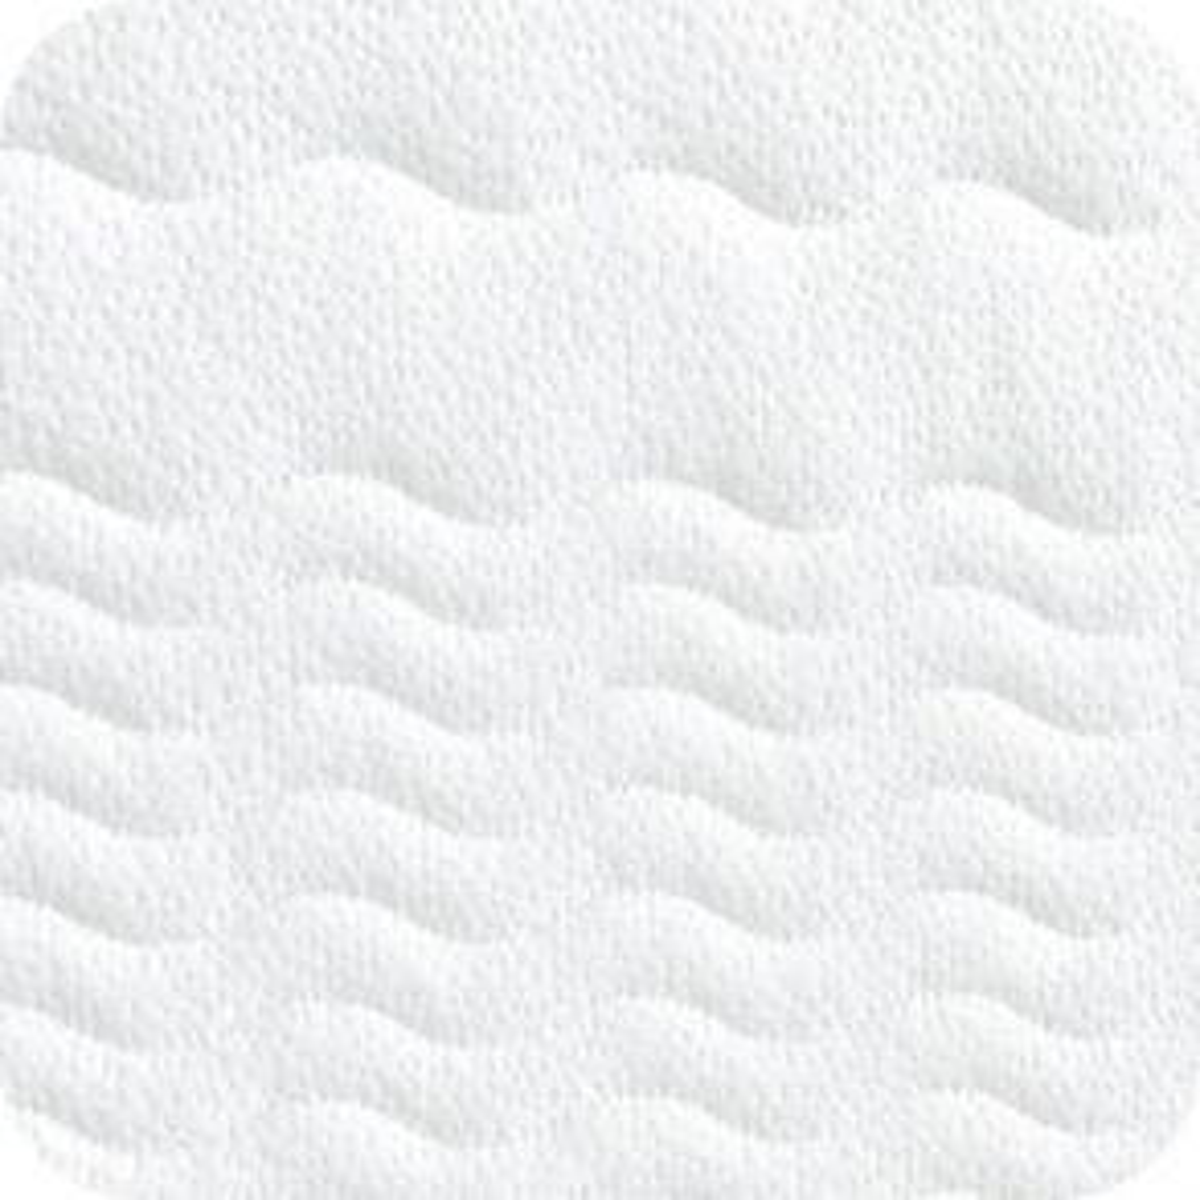 Pokrowiec na materac SMART 140x200